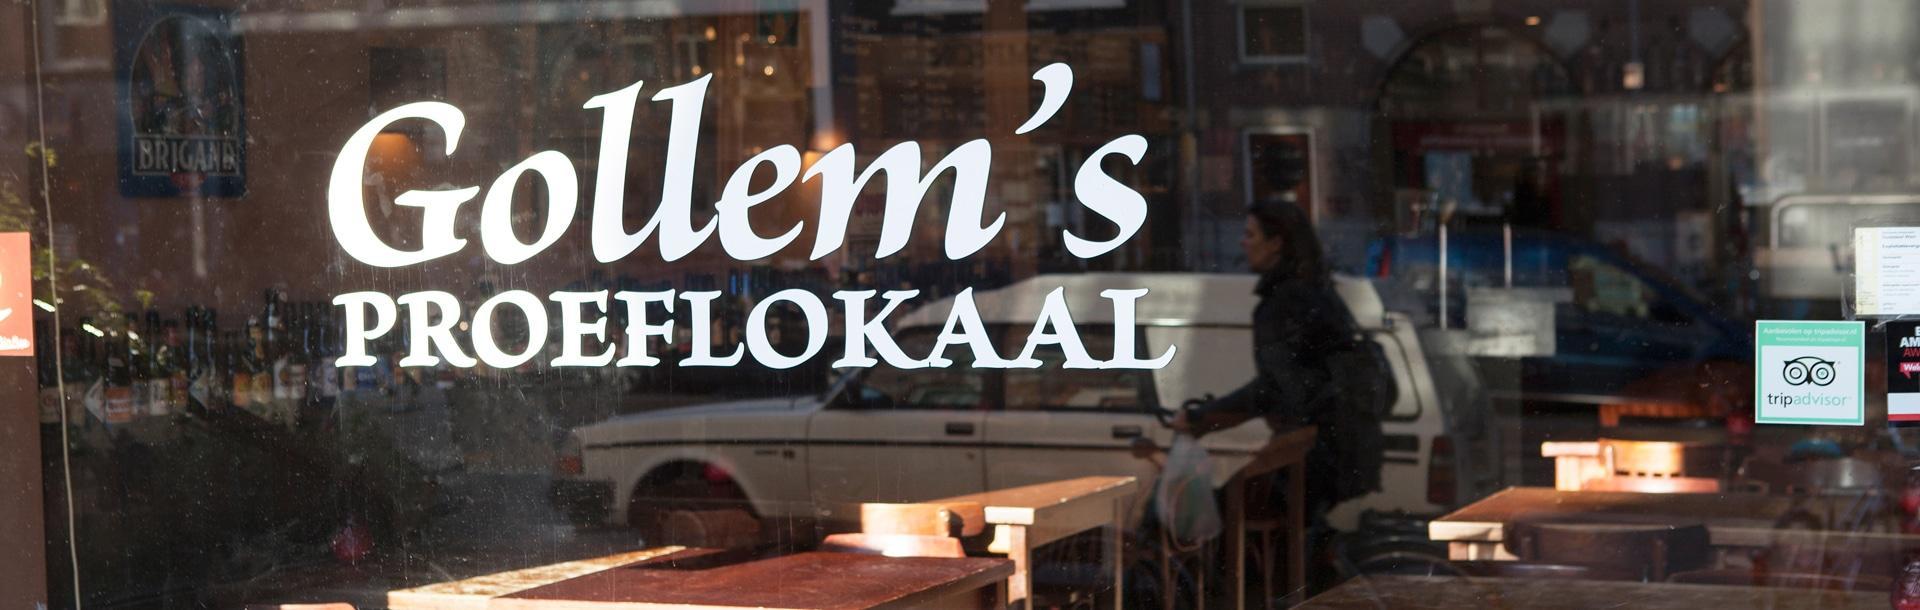 Gollem_Nice2know_locatie